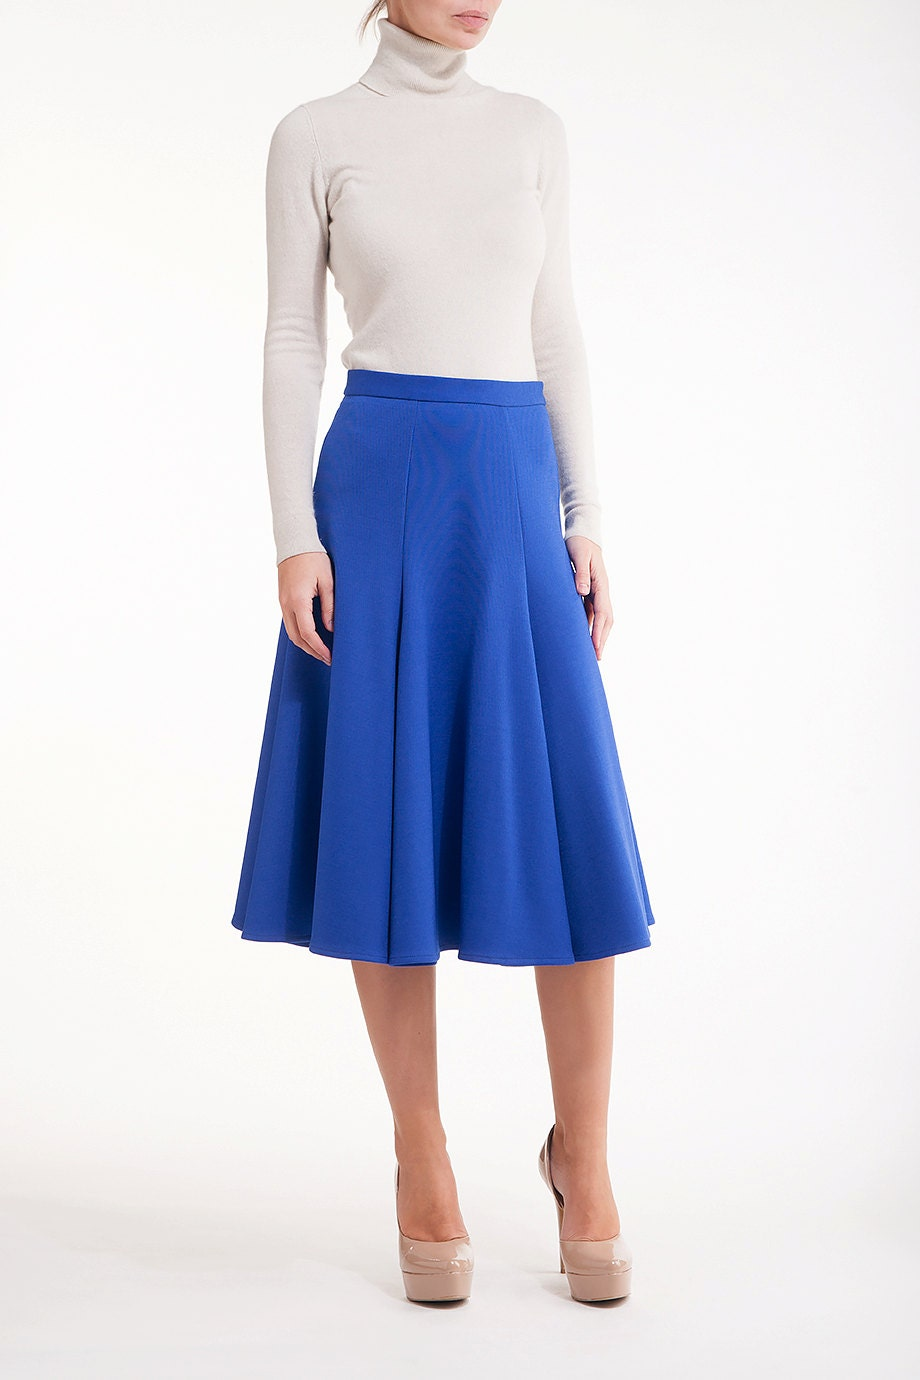 cobalt blue flared midi skirt by lanastepulapparel on etsy